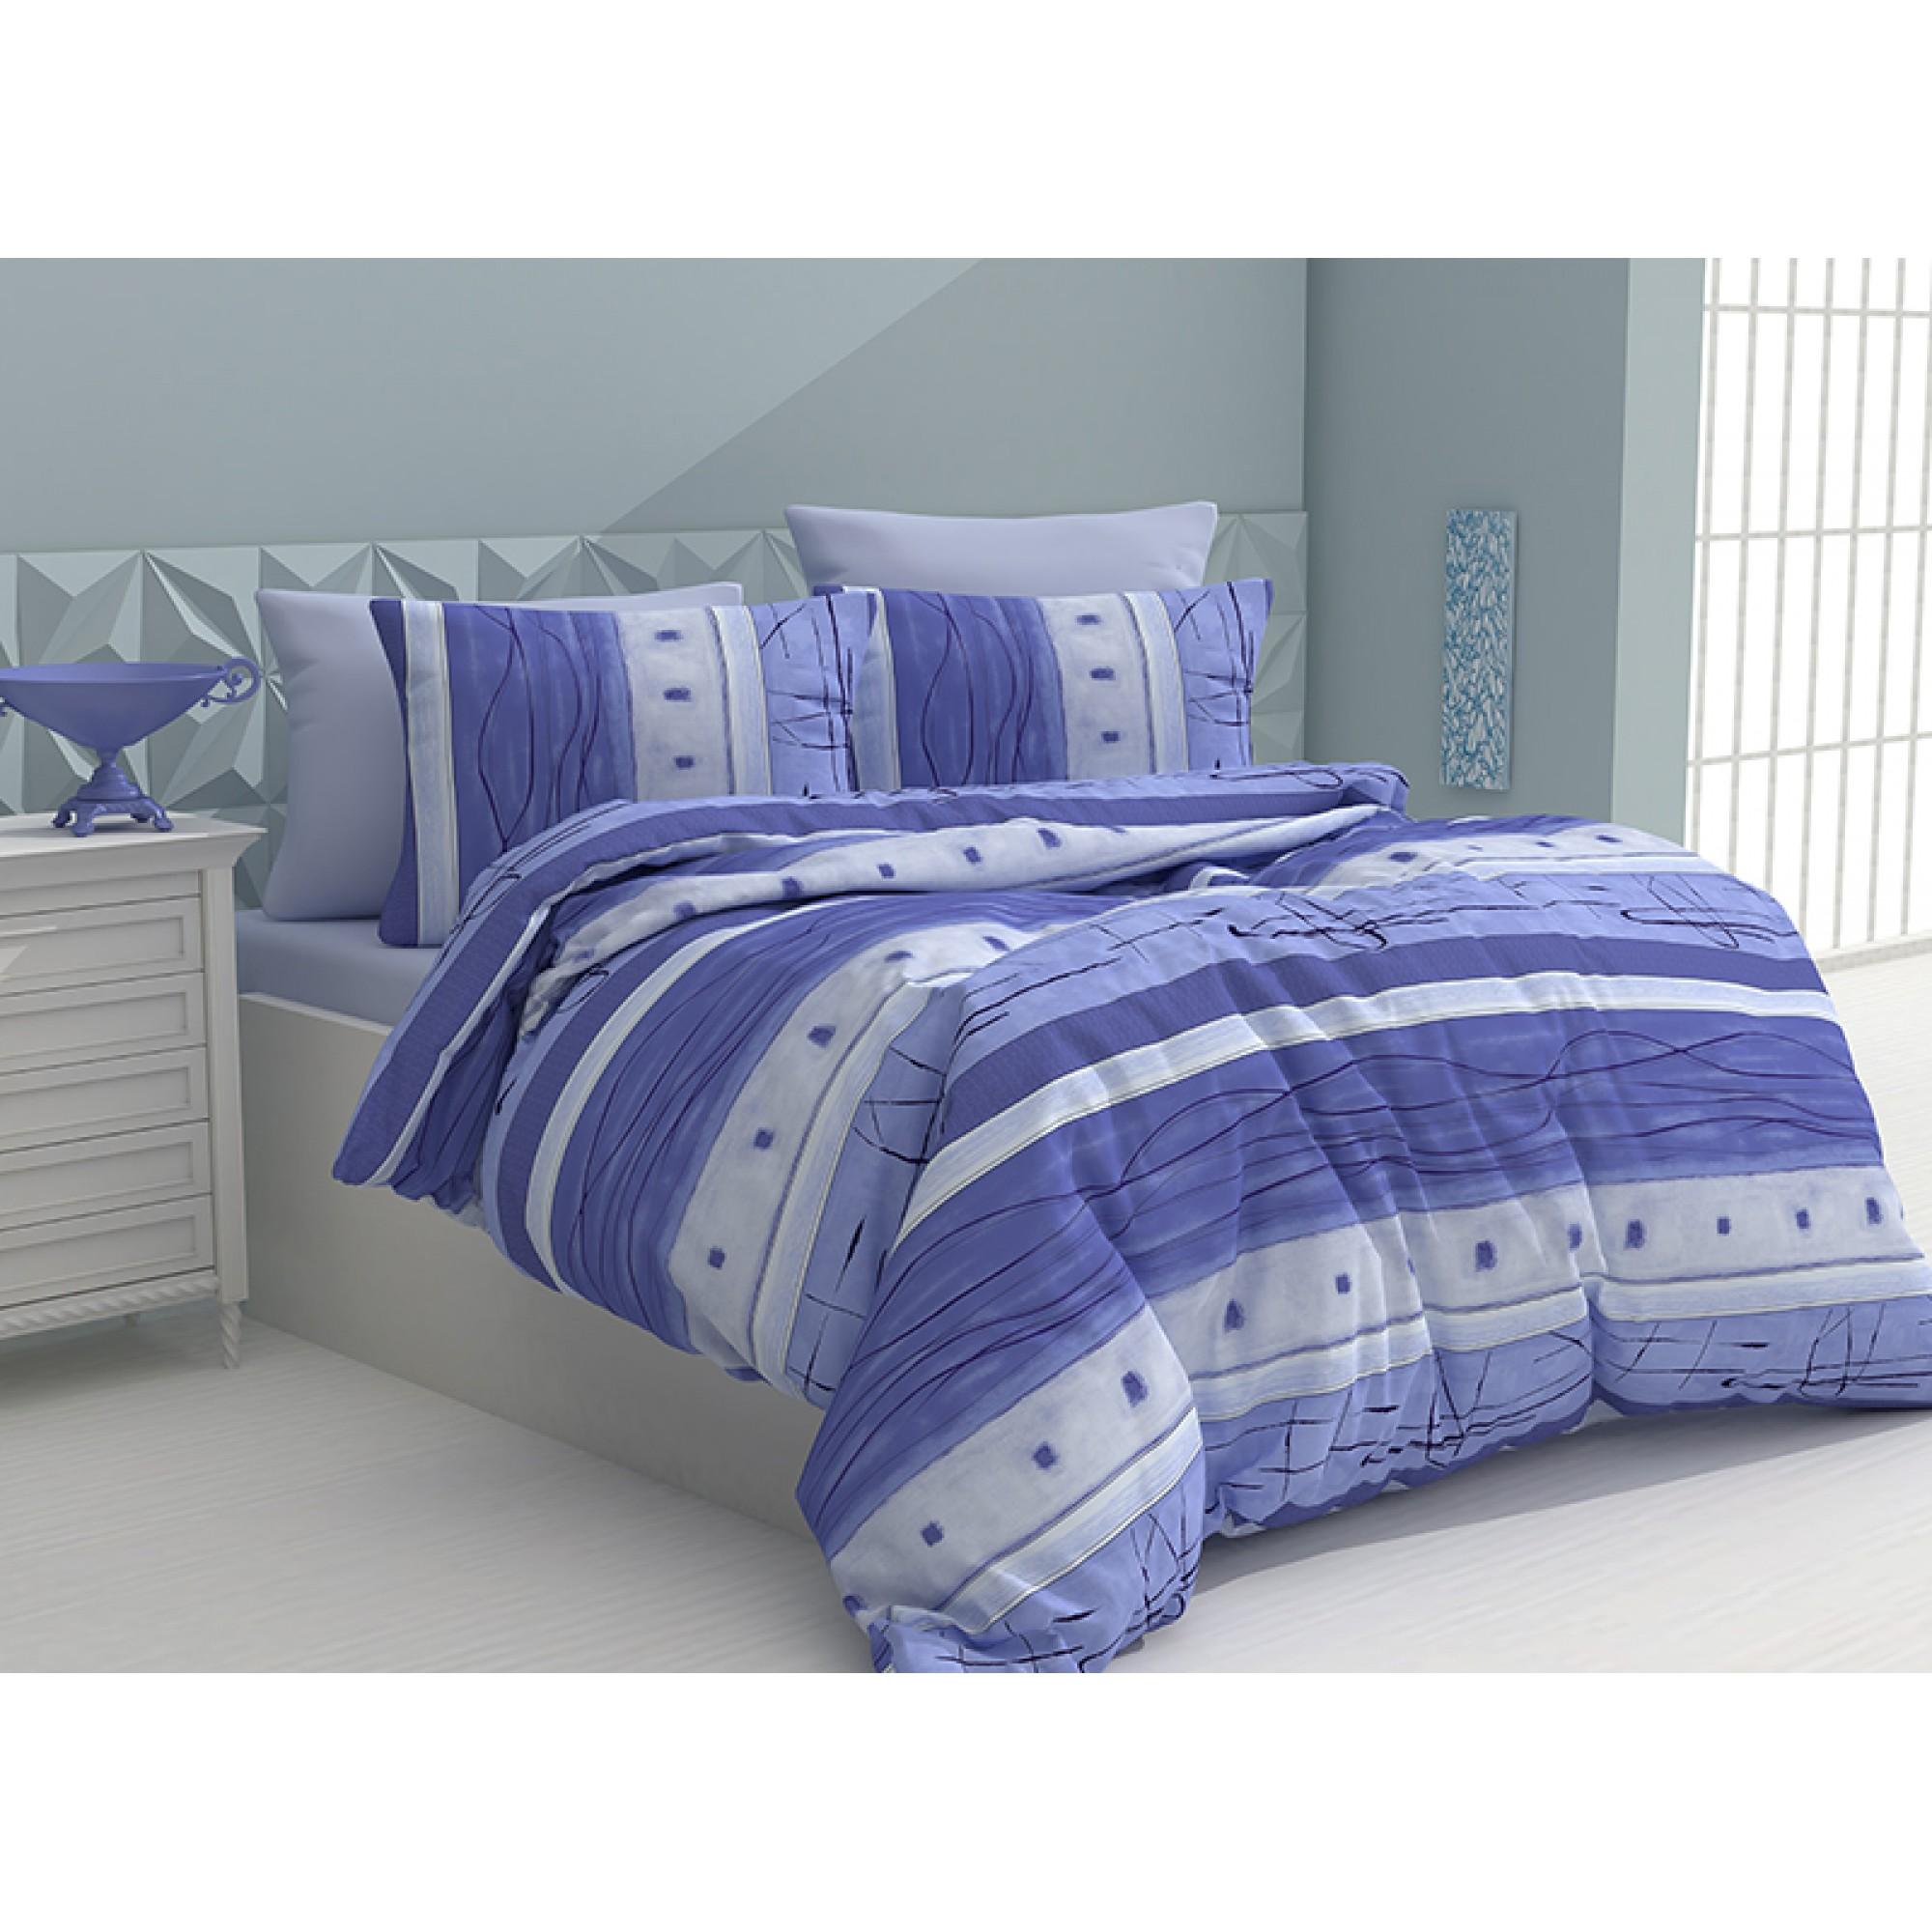 Спален комплект RELAX 100% Памук